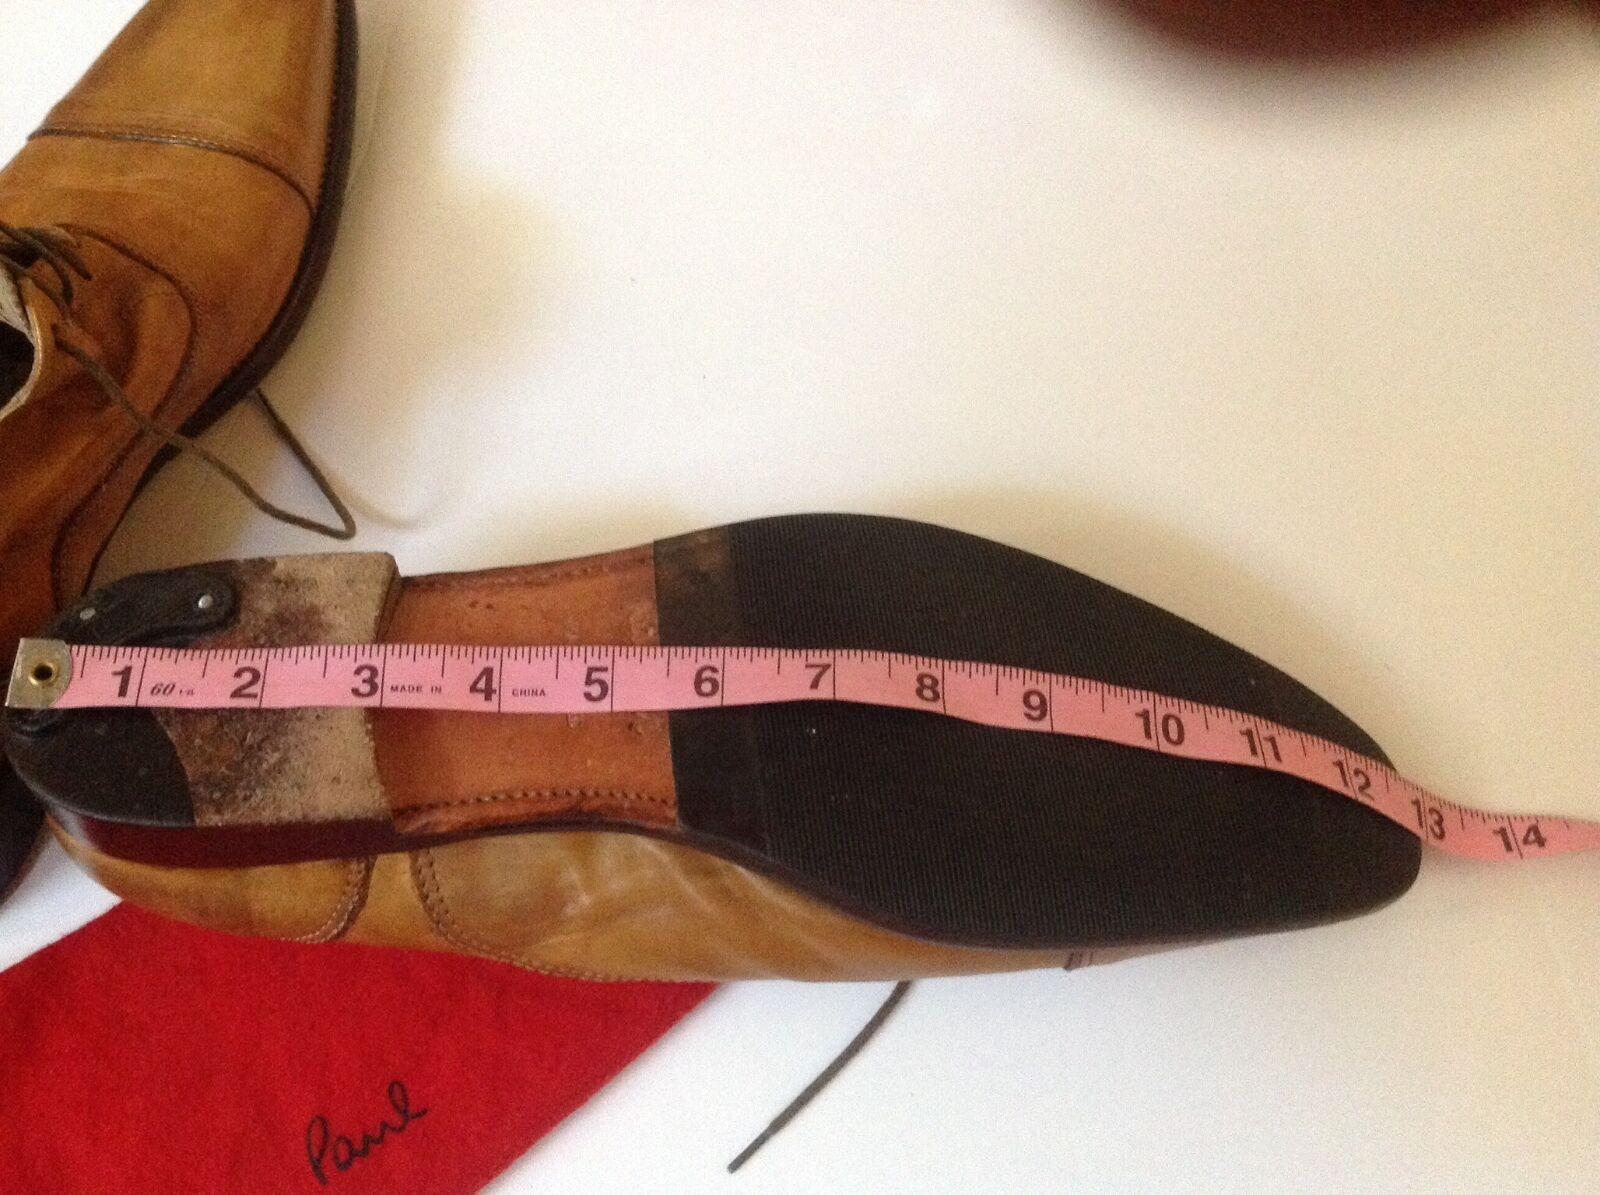 Paul Smith - PAIR OF TAN TAN TAN HANDCRAFTED CAPTOE schuhe - Größe 10UK 44 EURO a60ebb